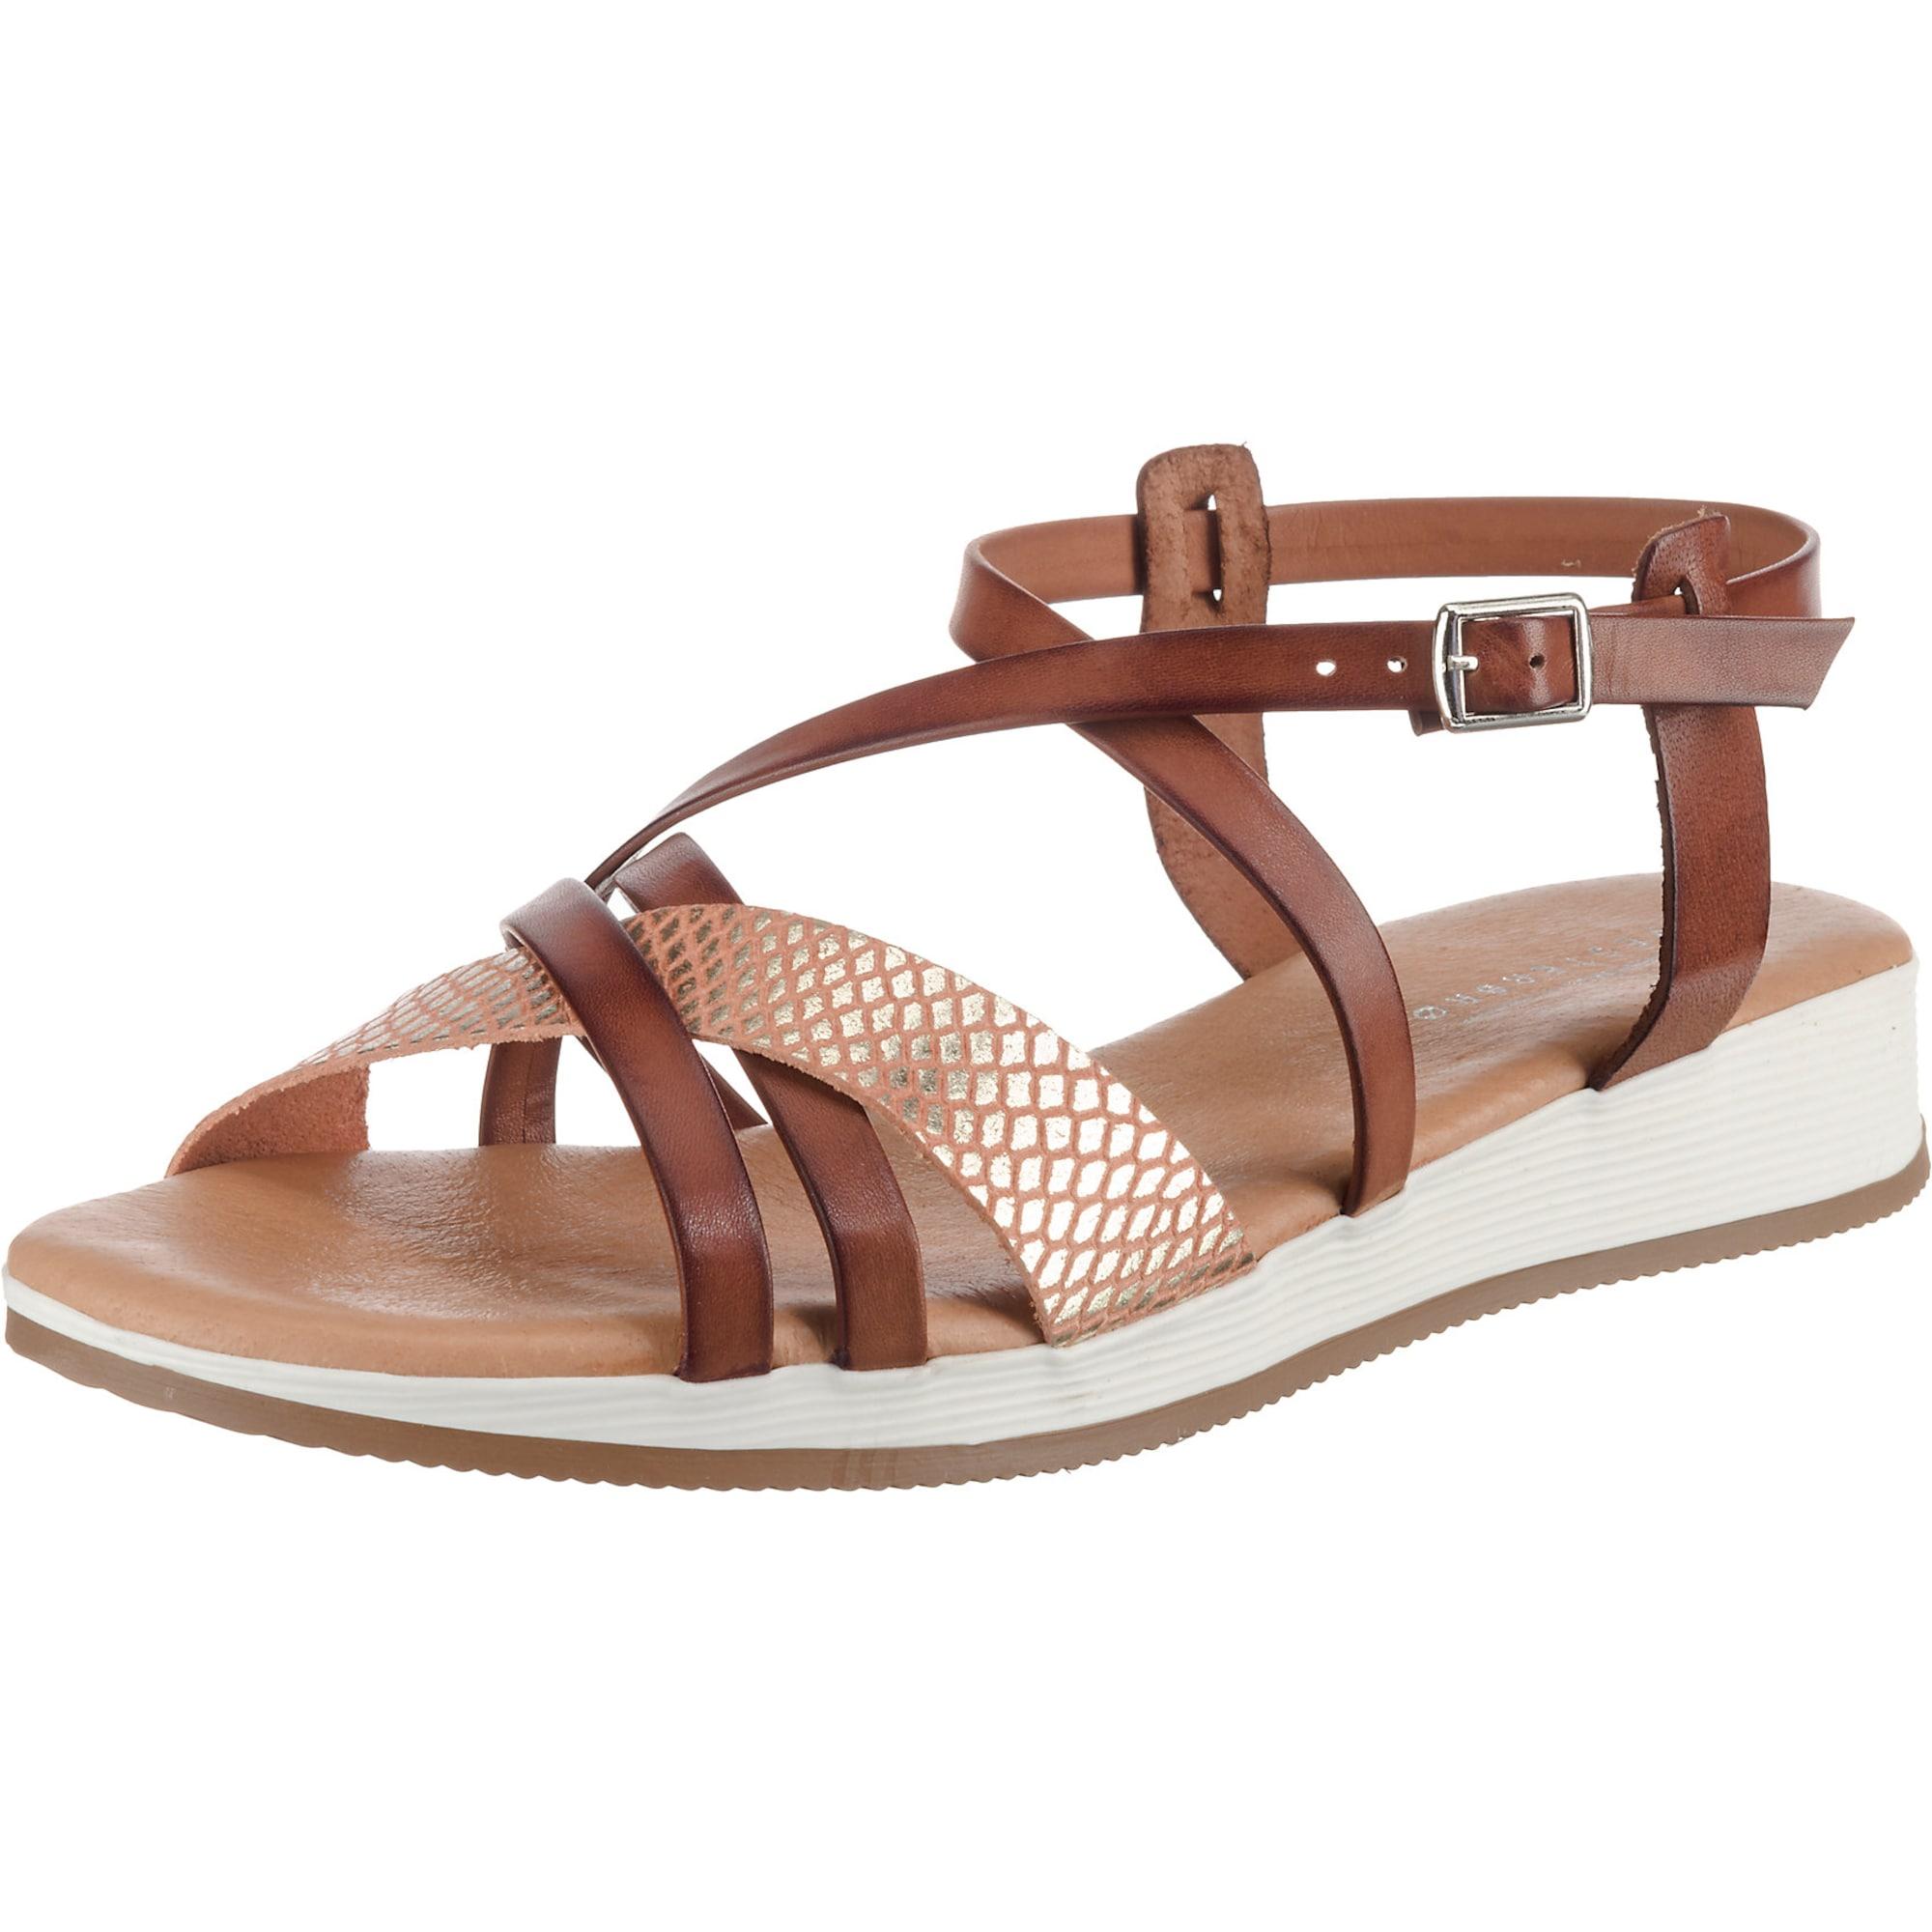 Sandalette | Schuhe > Sandalen & Zehentrenner | Braun | Paul Vesterbro